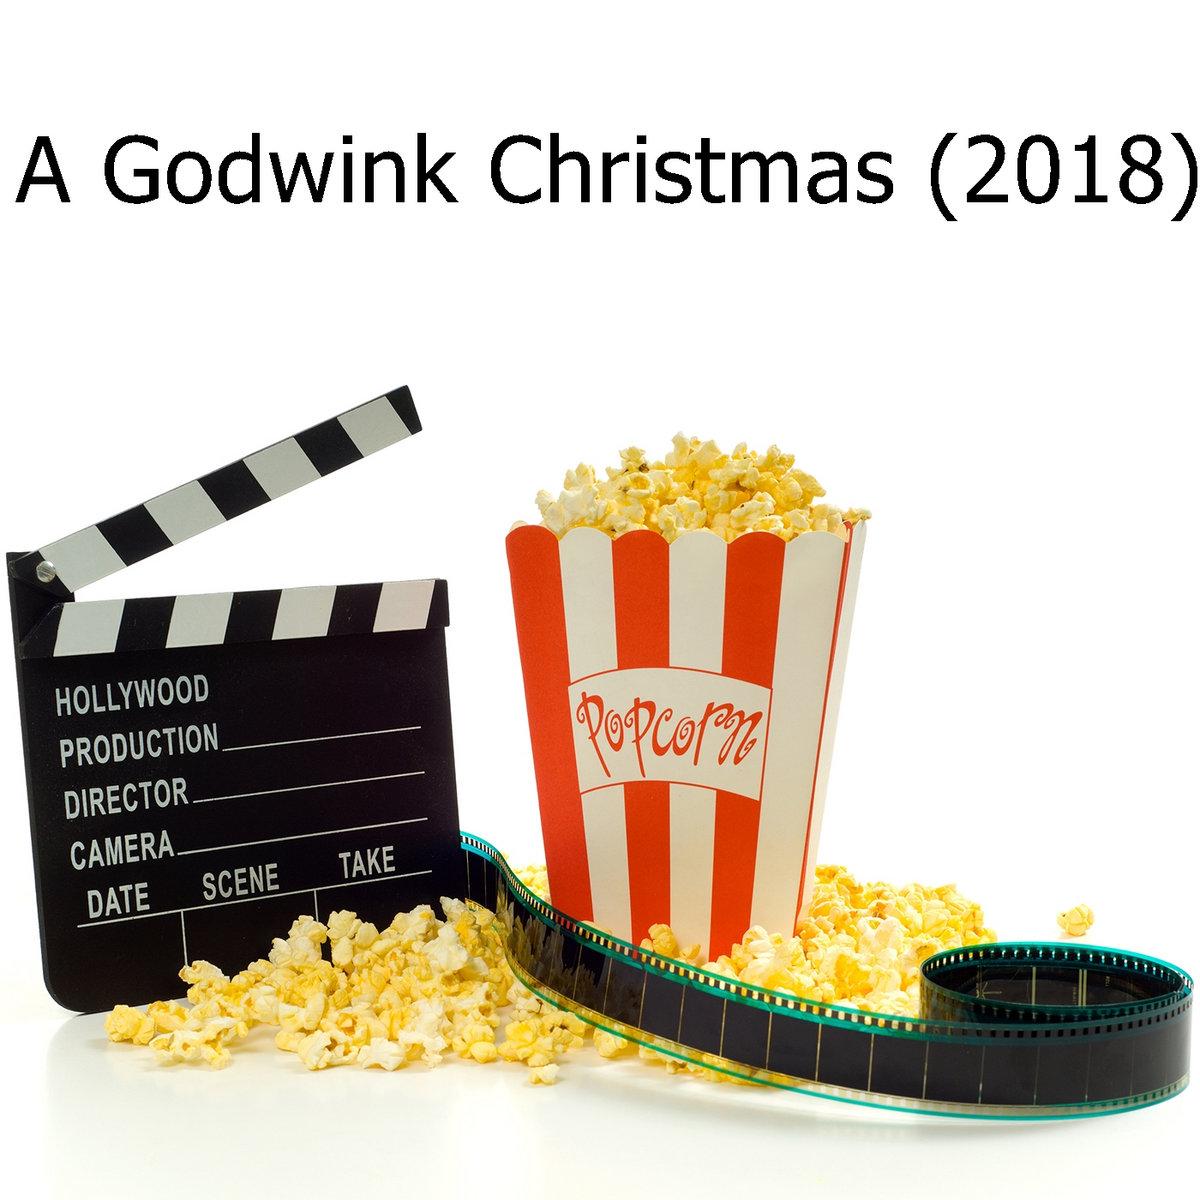 A Godwink Christmas.For Macbook Full A Godwink Christmas Release Diaswitalunli